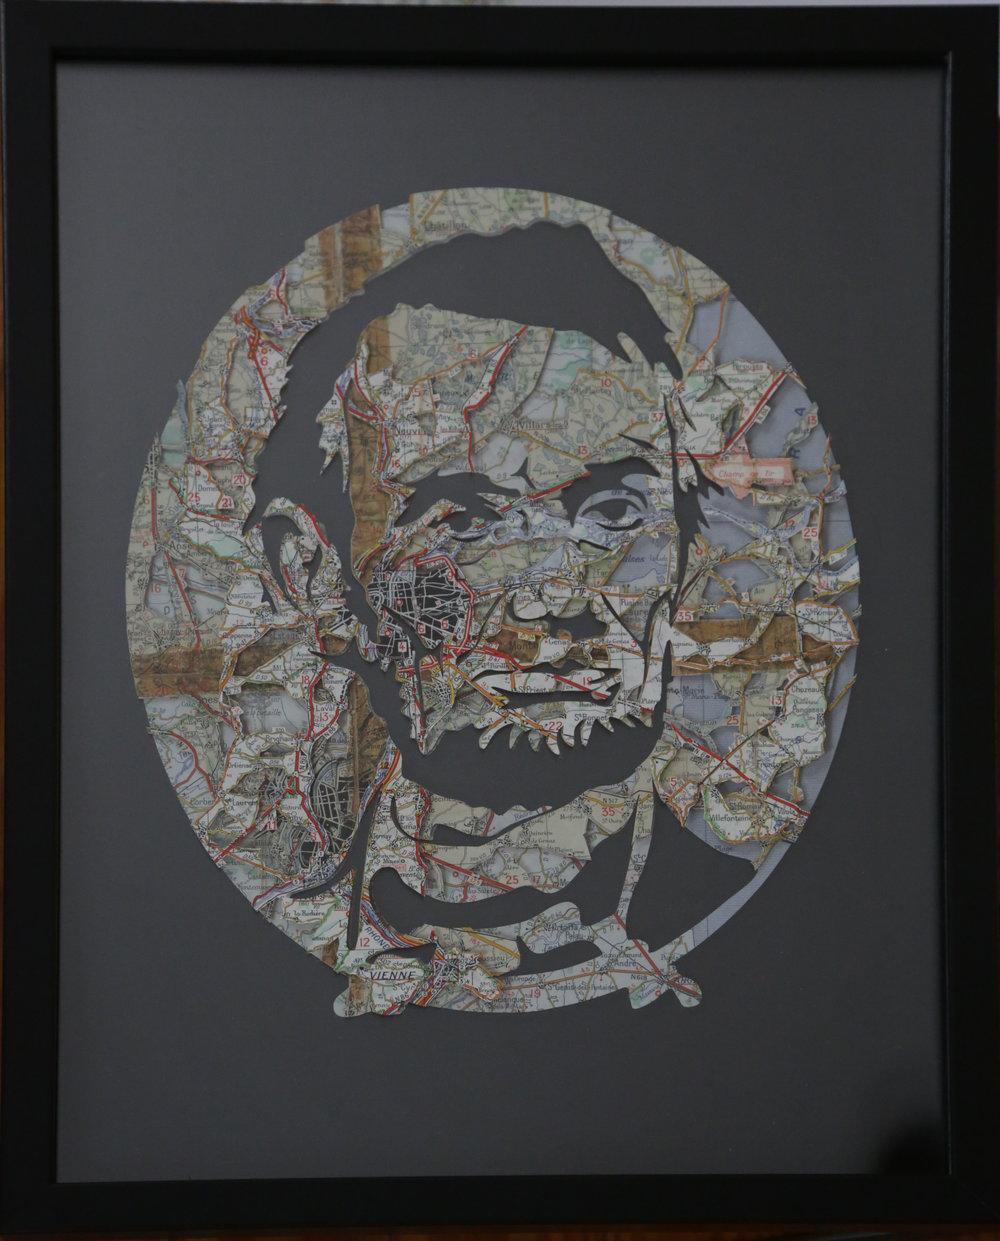 GalleryOonH-Joanathan Bessaci-Lincoln-2017-Michelin maps and glass-16x12-1100.JPG